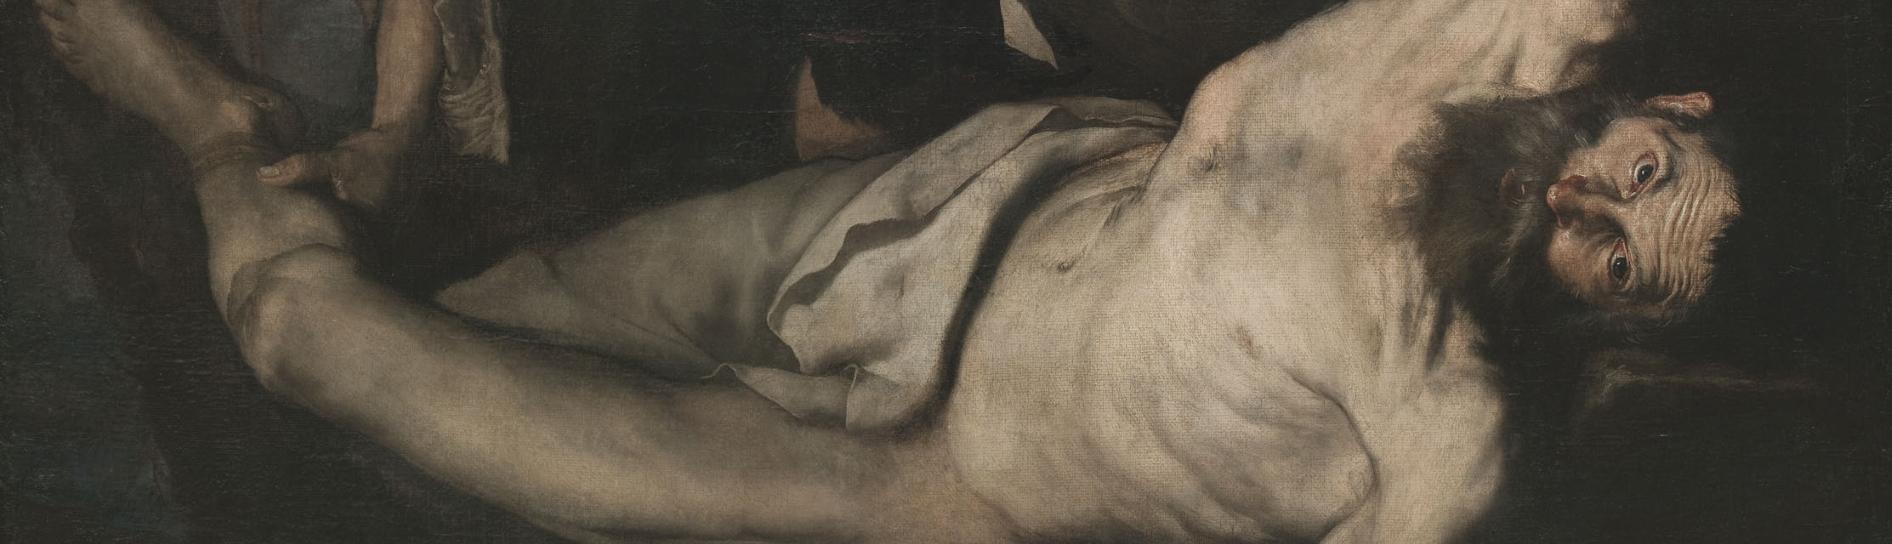 Josep de Ribera o Jusepe de Ribera, Martirio de san Bartolomé, 1644